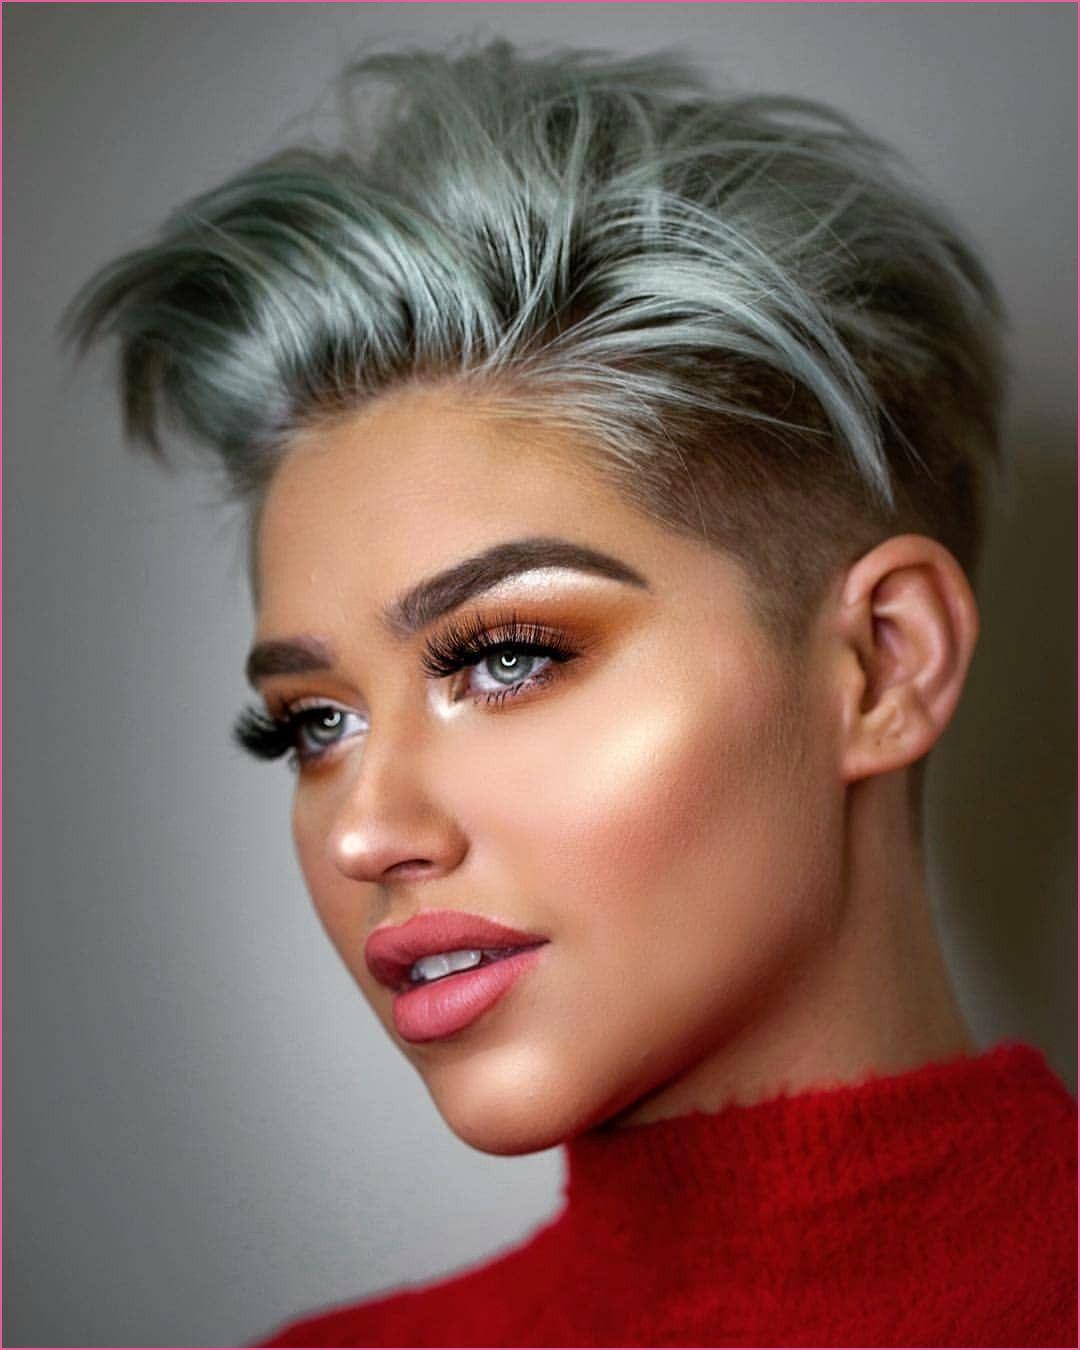 Sidecut Kurze Haare In 2020 Kapsels Kapsels Voor Kort Haar Kort Haar Kapsels